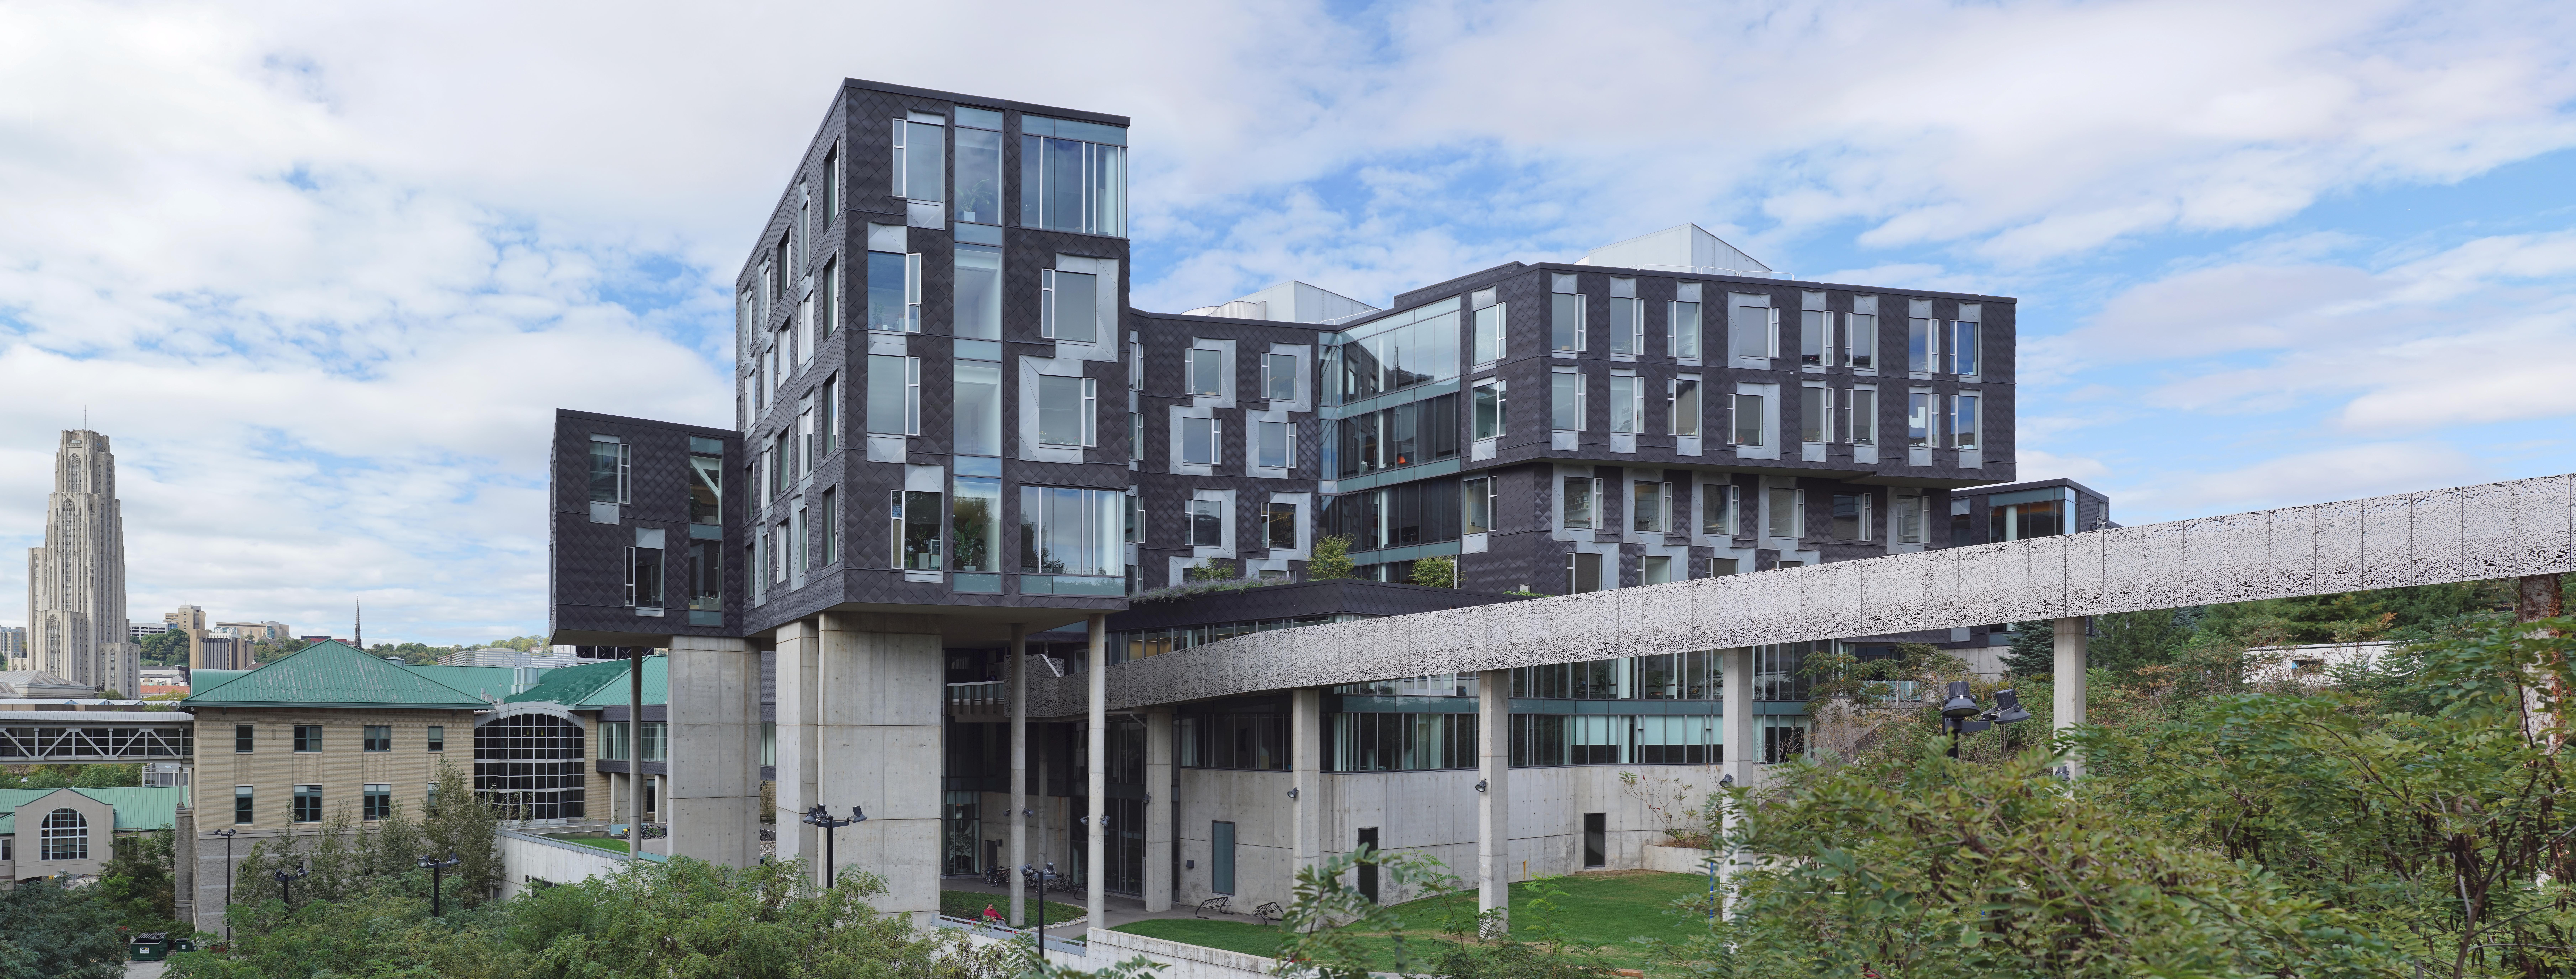 file gates hillman complex at carnegie mellon university jpg